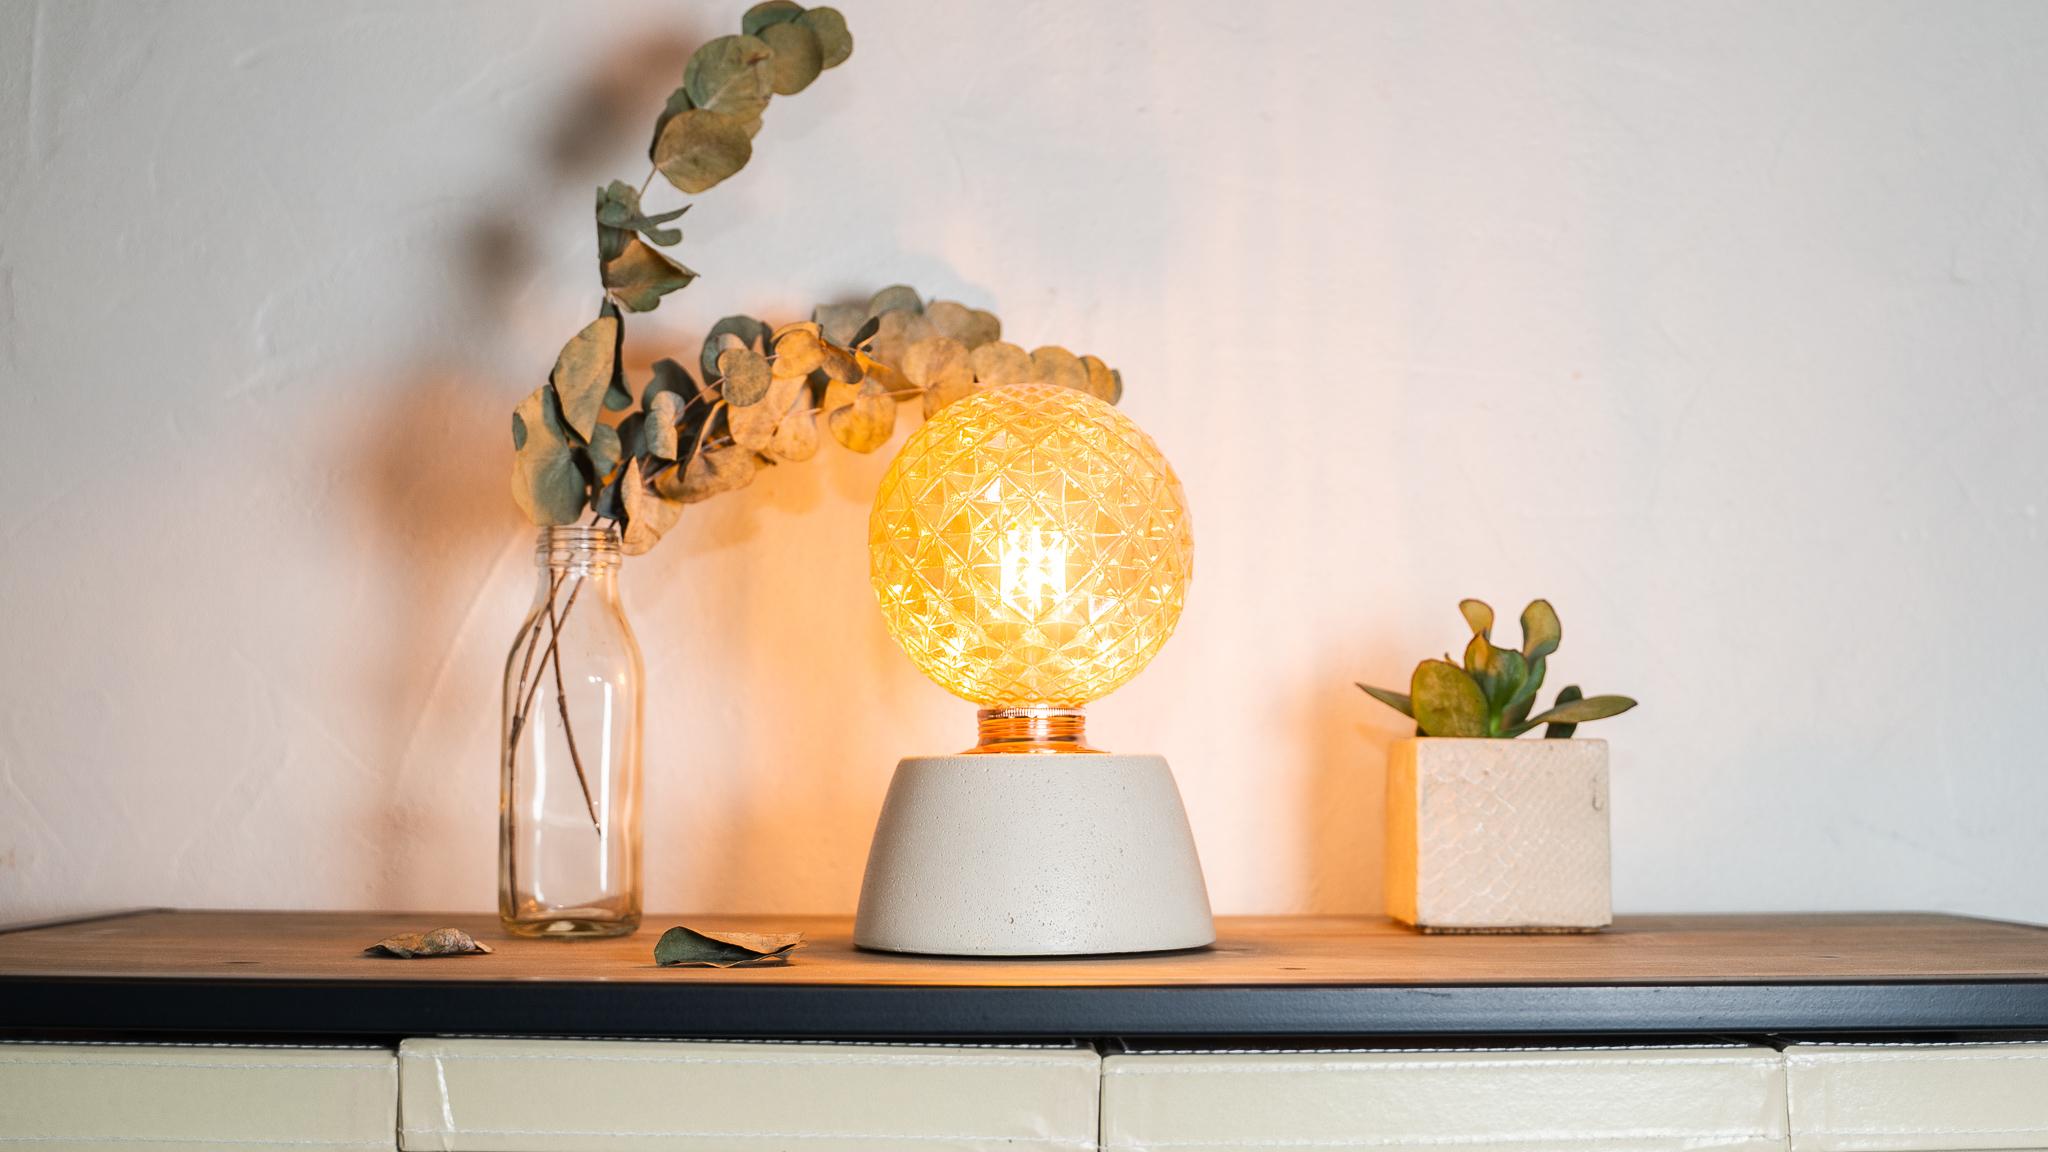 Lampe dôme diamant béton beige fabrication artisanale